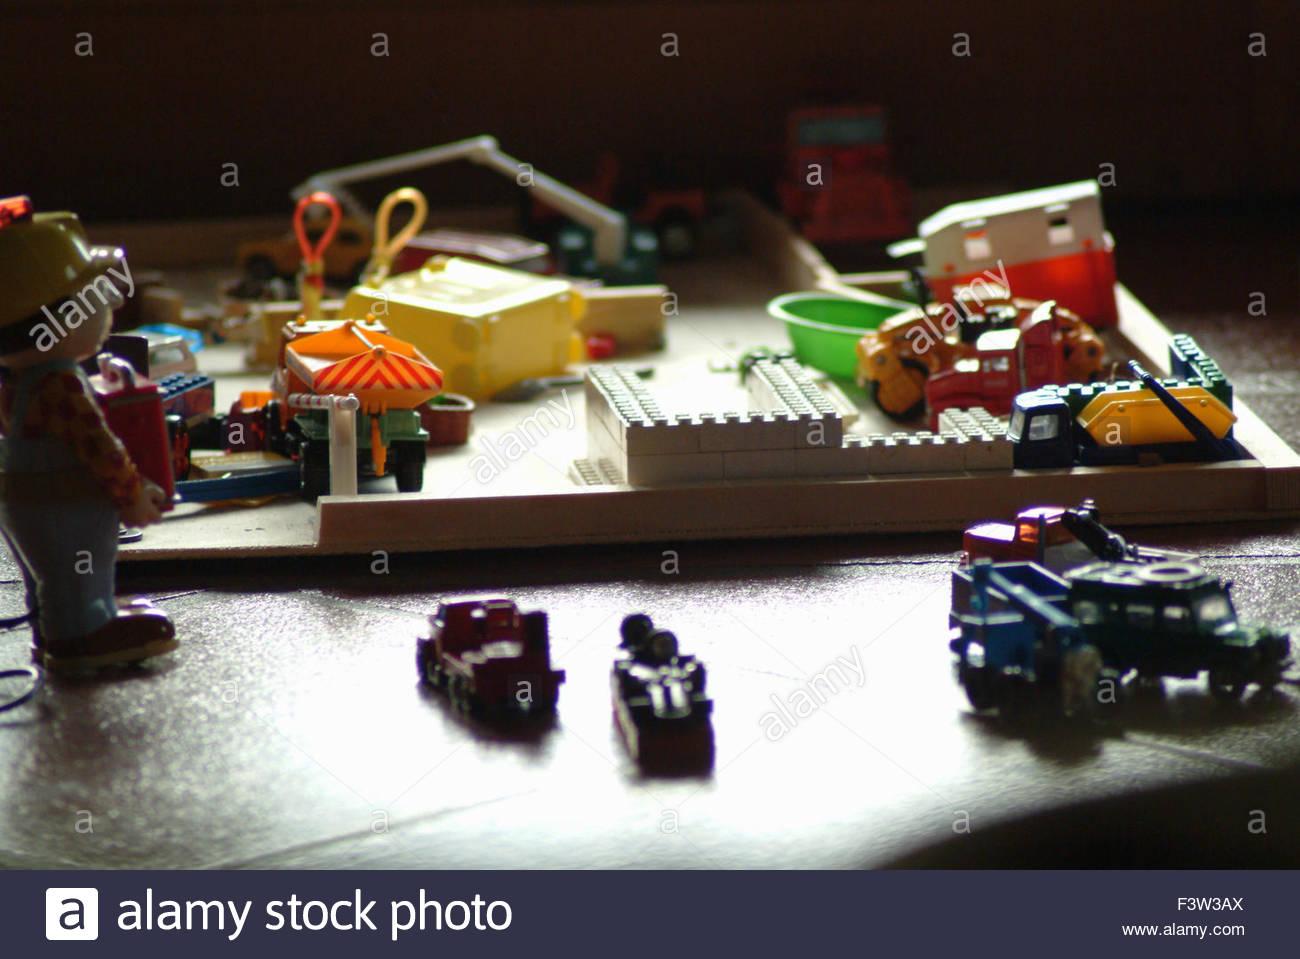 Child's Toys - Stock Image